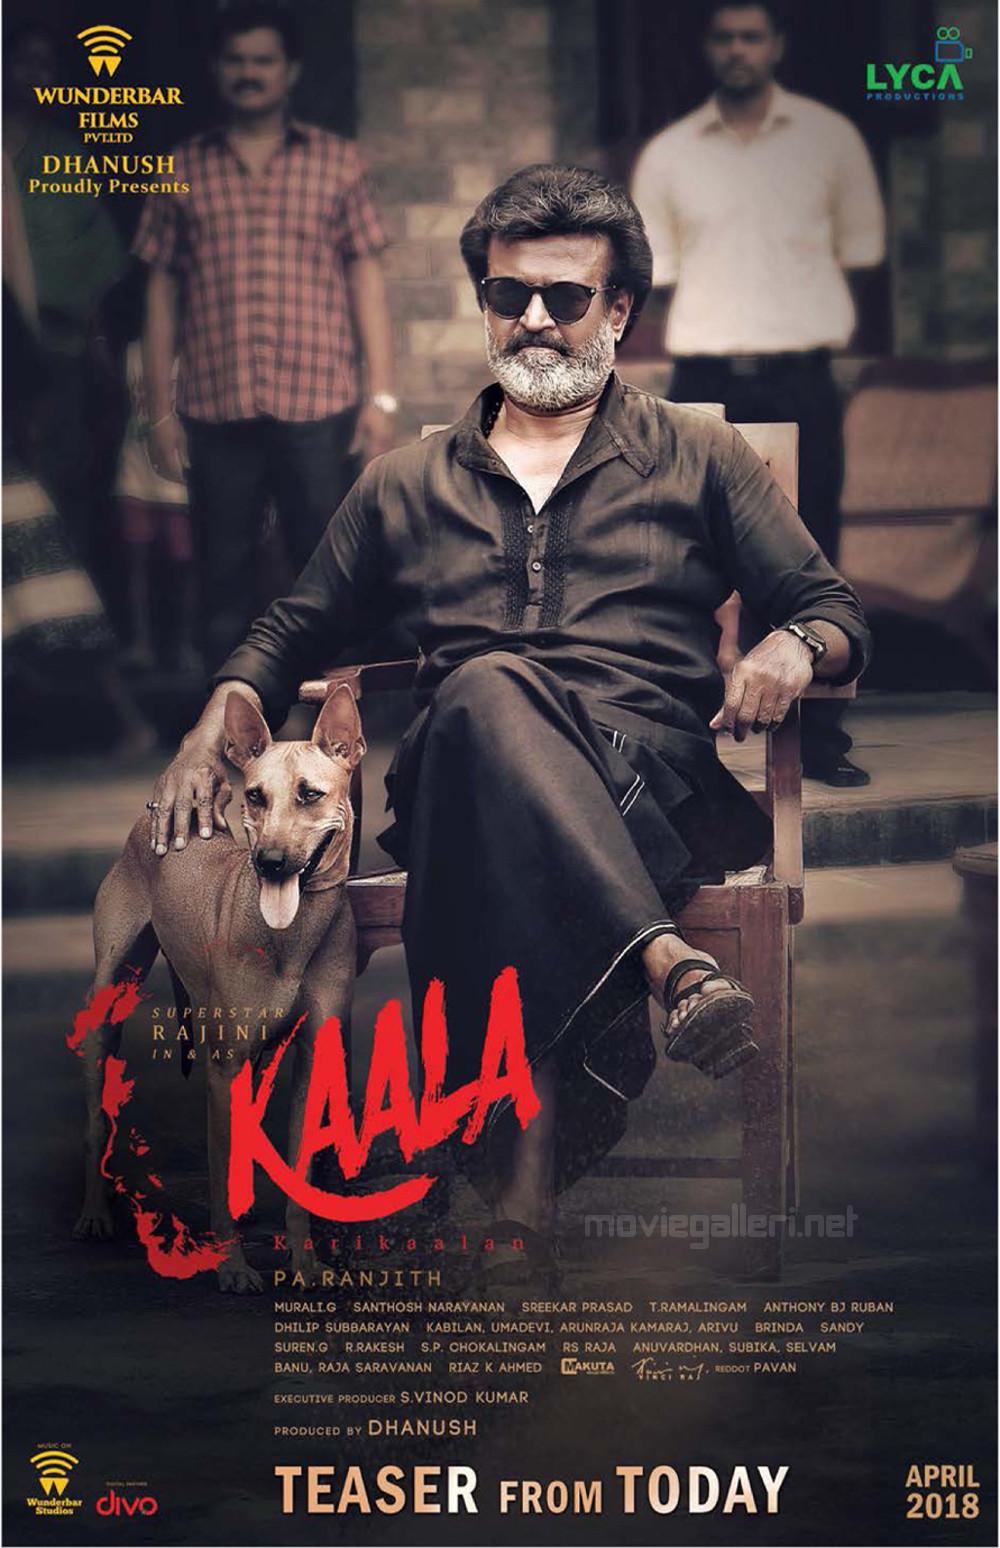 Rajinikanth Kaala Movie Teaser From Today Poster